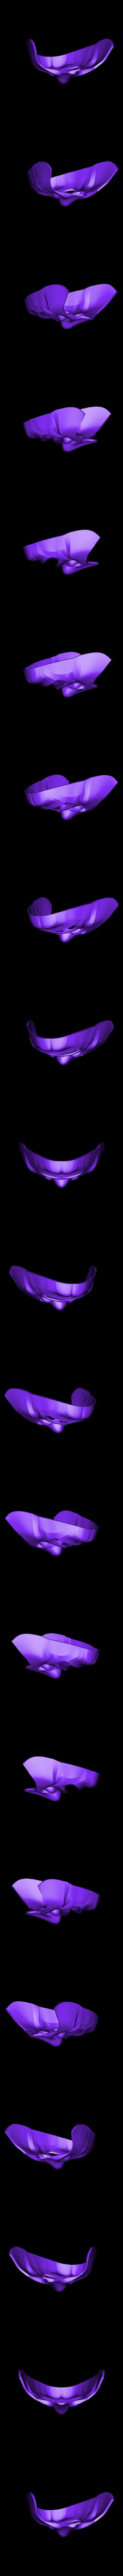 Samurai_Half_Mask_v1.stl Download free STL file Samurai Half Mask (Mempo) • Model to 3D print, VillainousPropShop